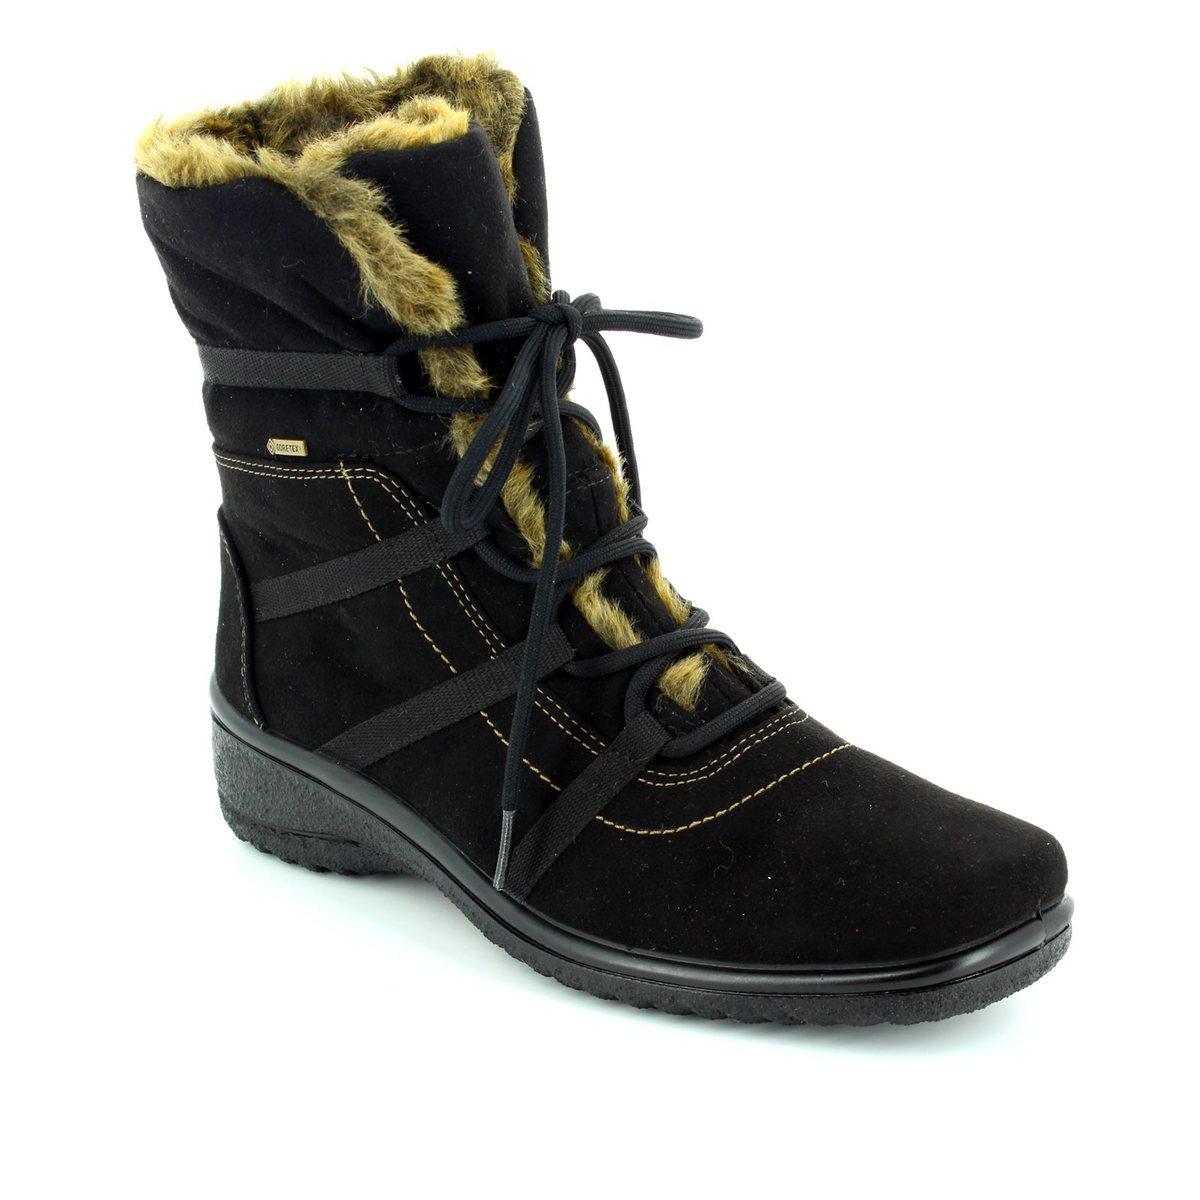 029549bacc5 Ara Winter Boots - Black - 48523/06 Munich Boot Gore-tex